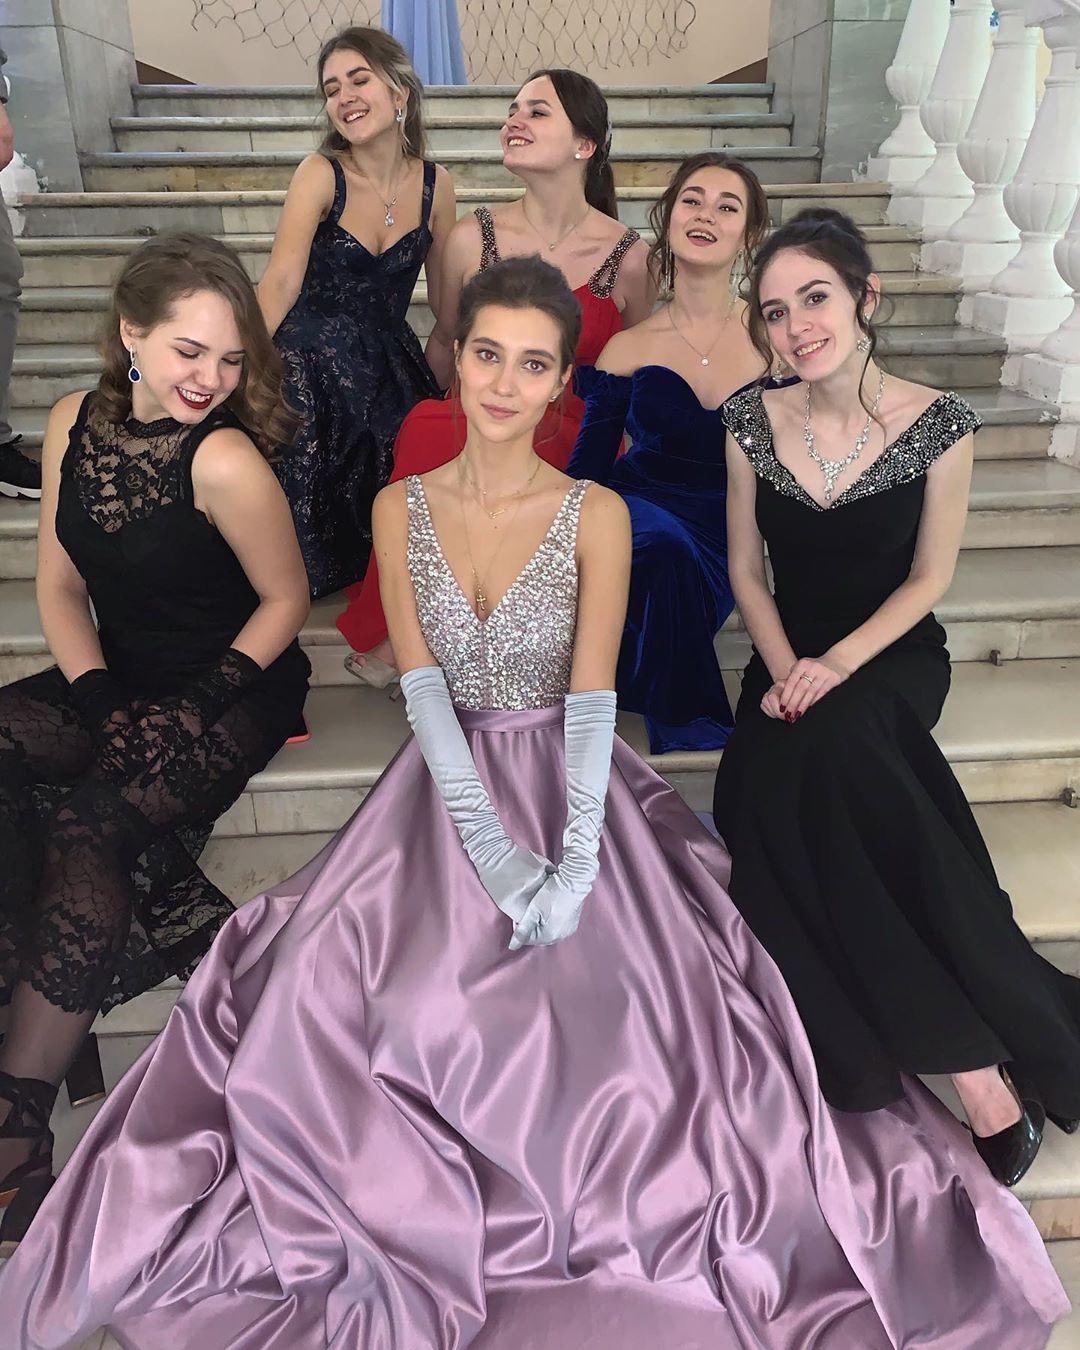 Студентки МГУ позируют на лестнице